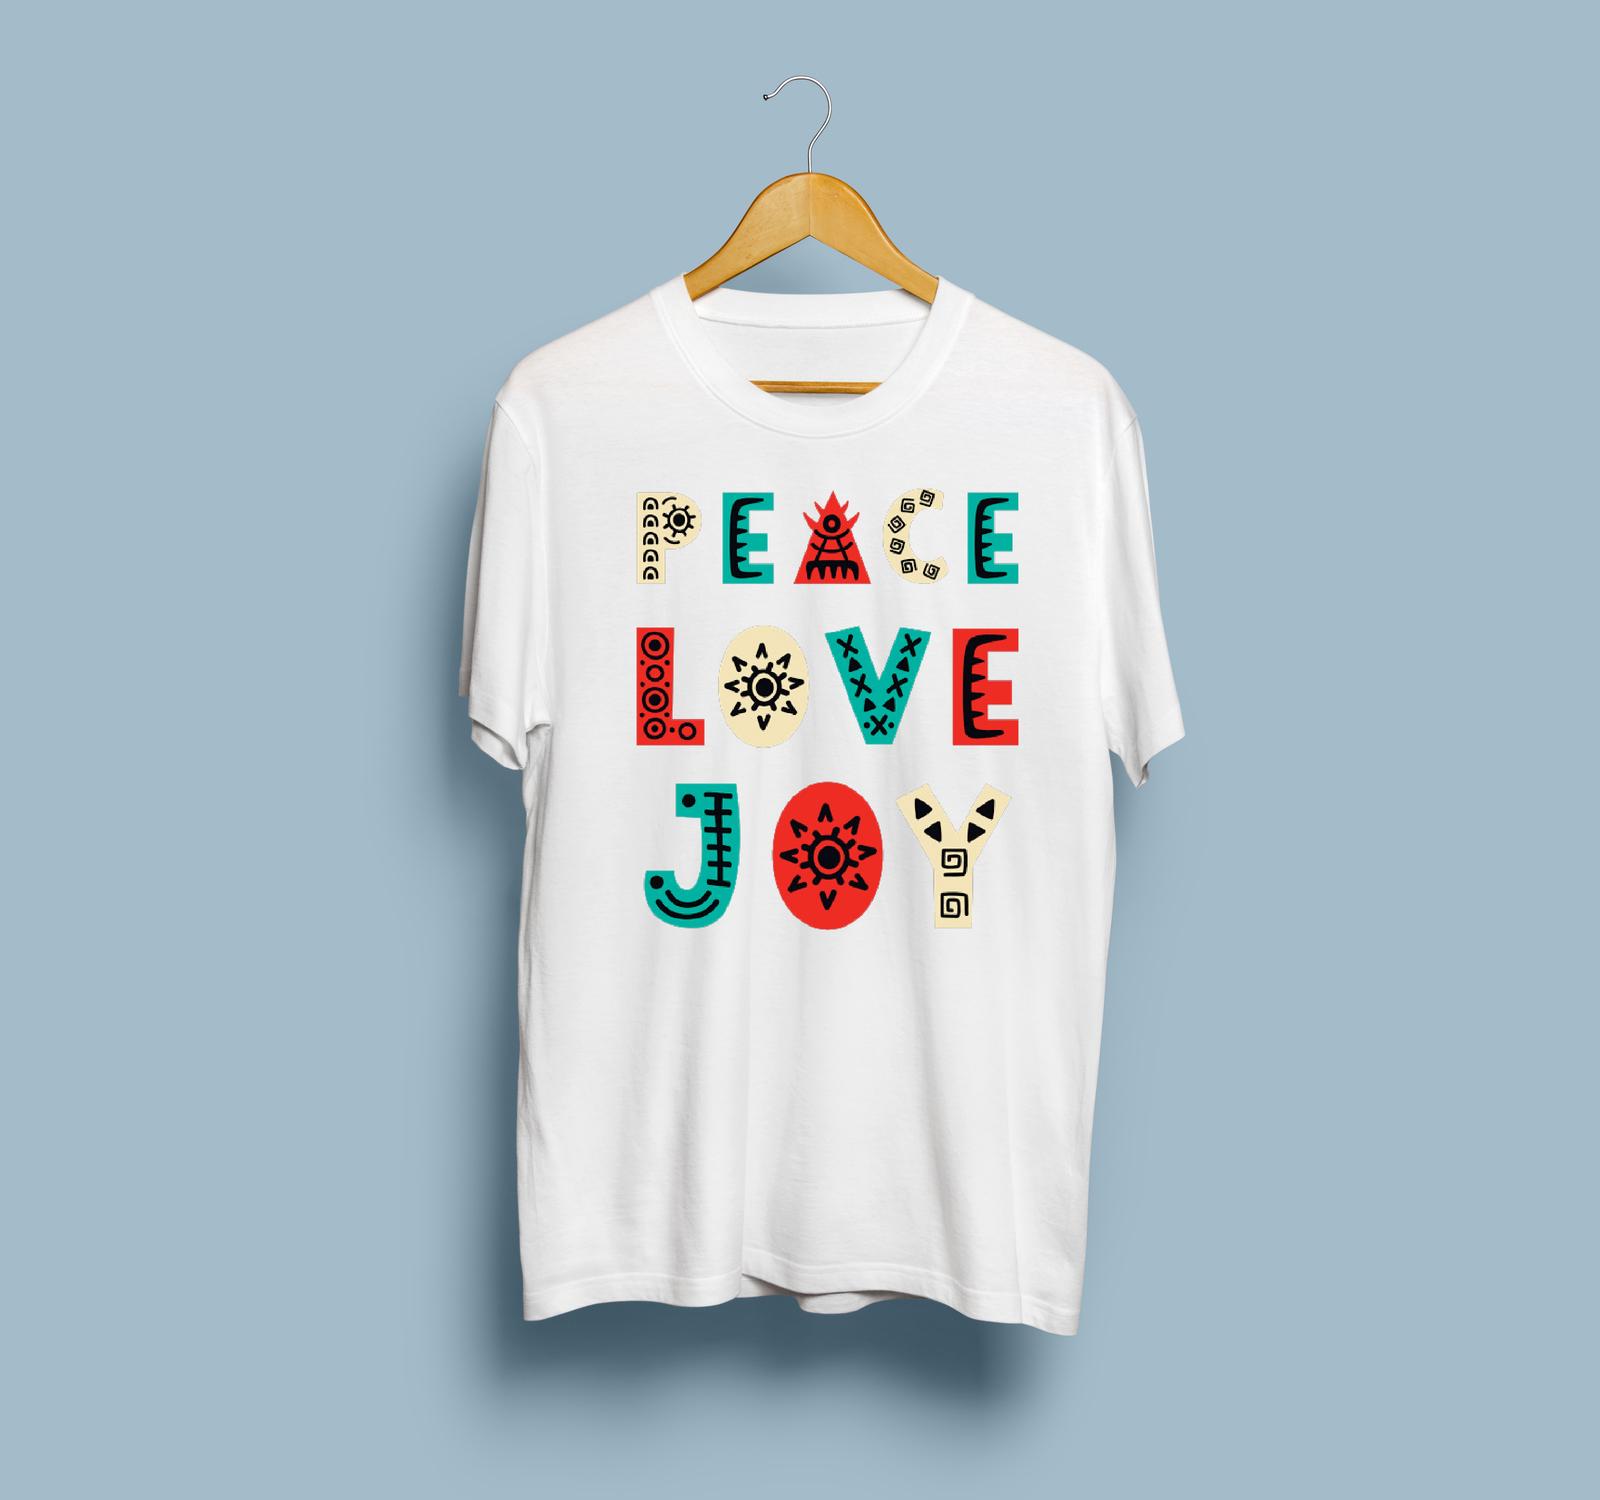 HOT SALE Peace Love Joy Gildan T-Shirt Size S To 2XL Free Shipping image 2